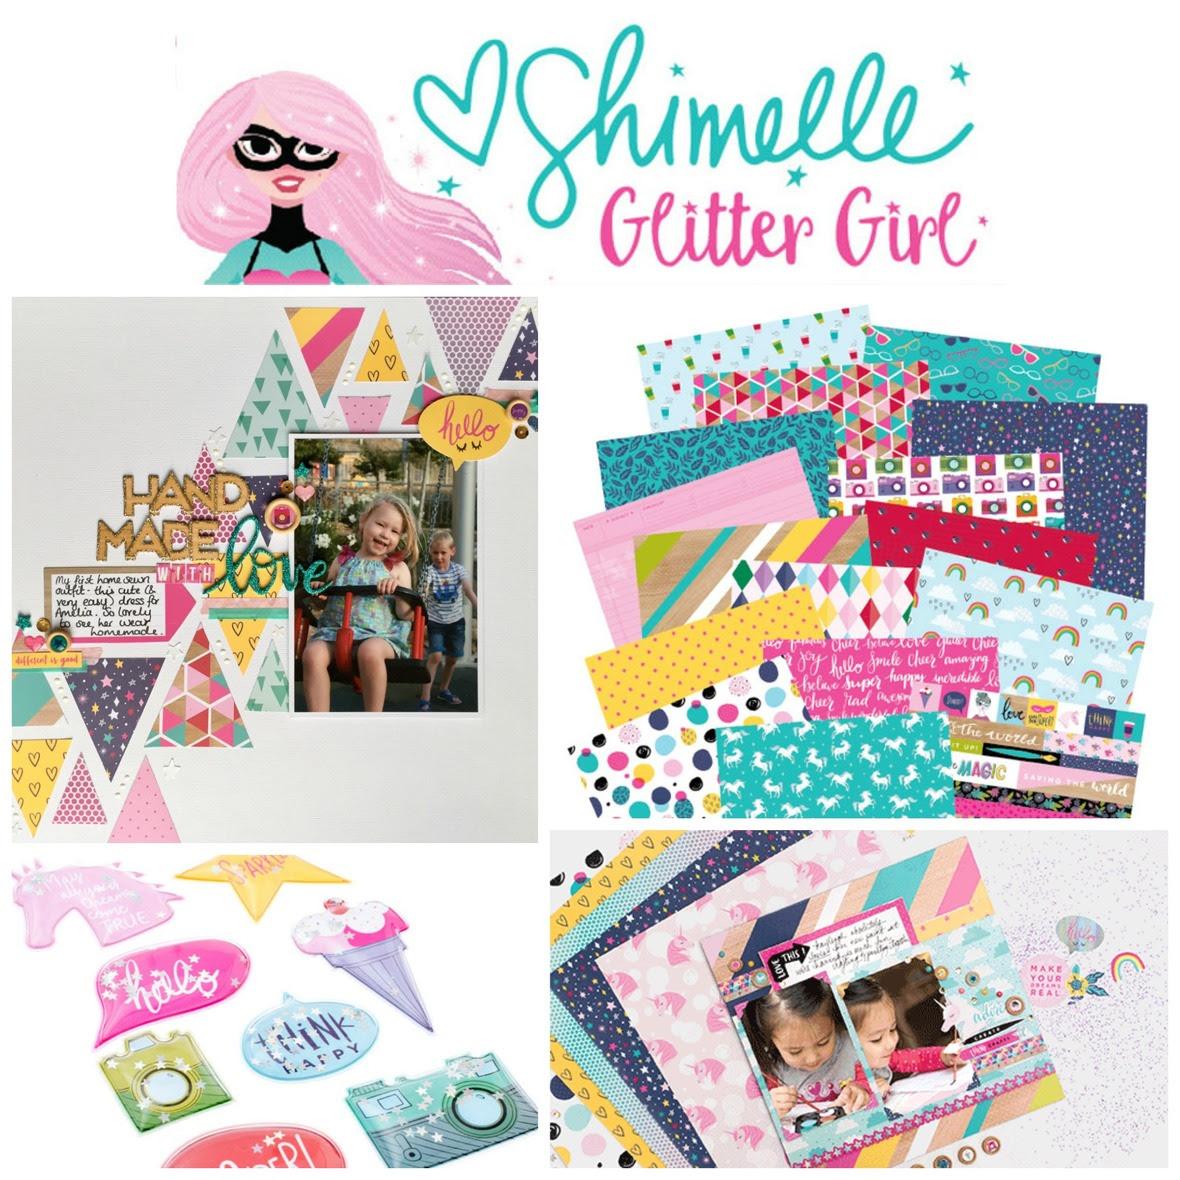 PicMonkey Collage glitter girl